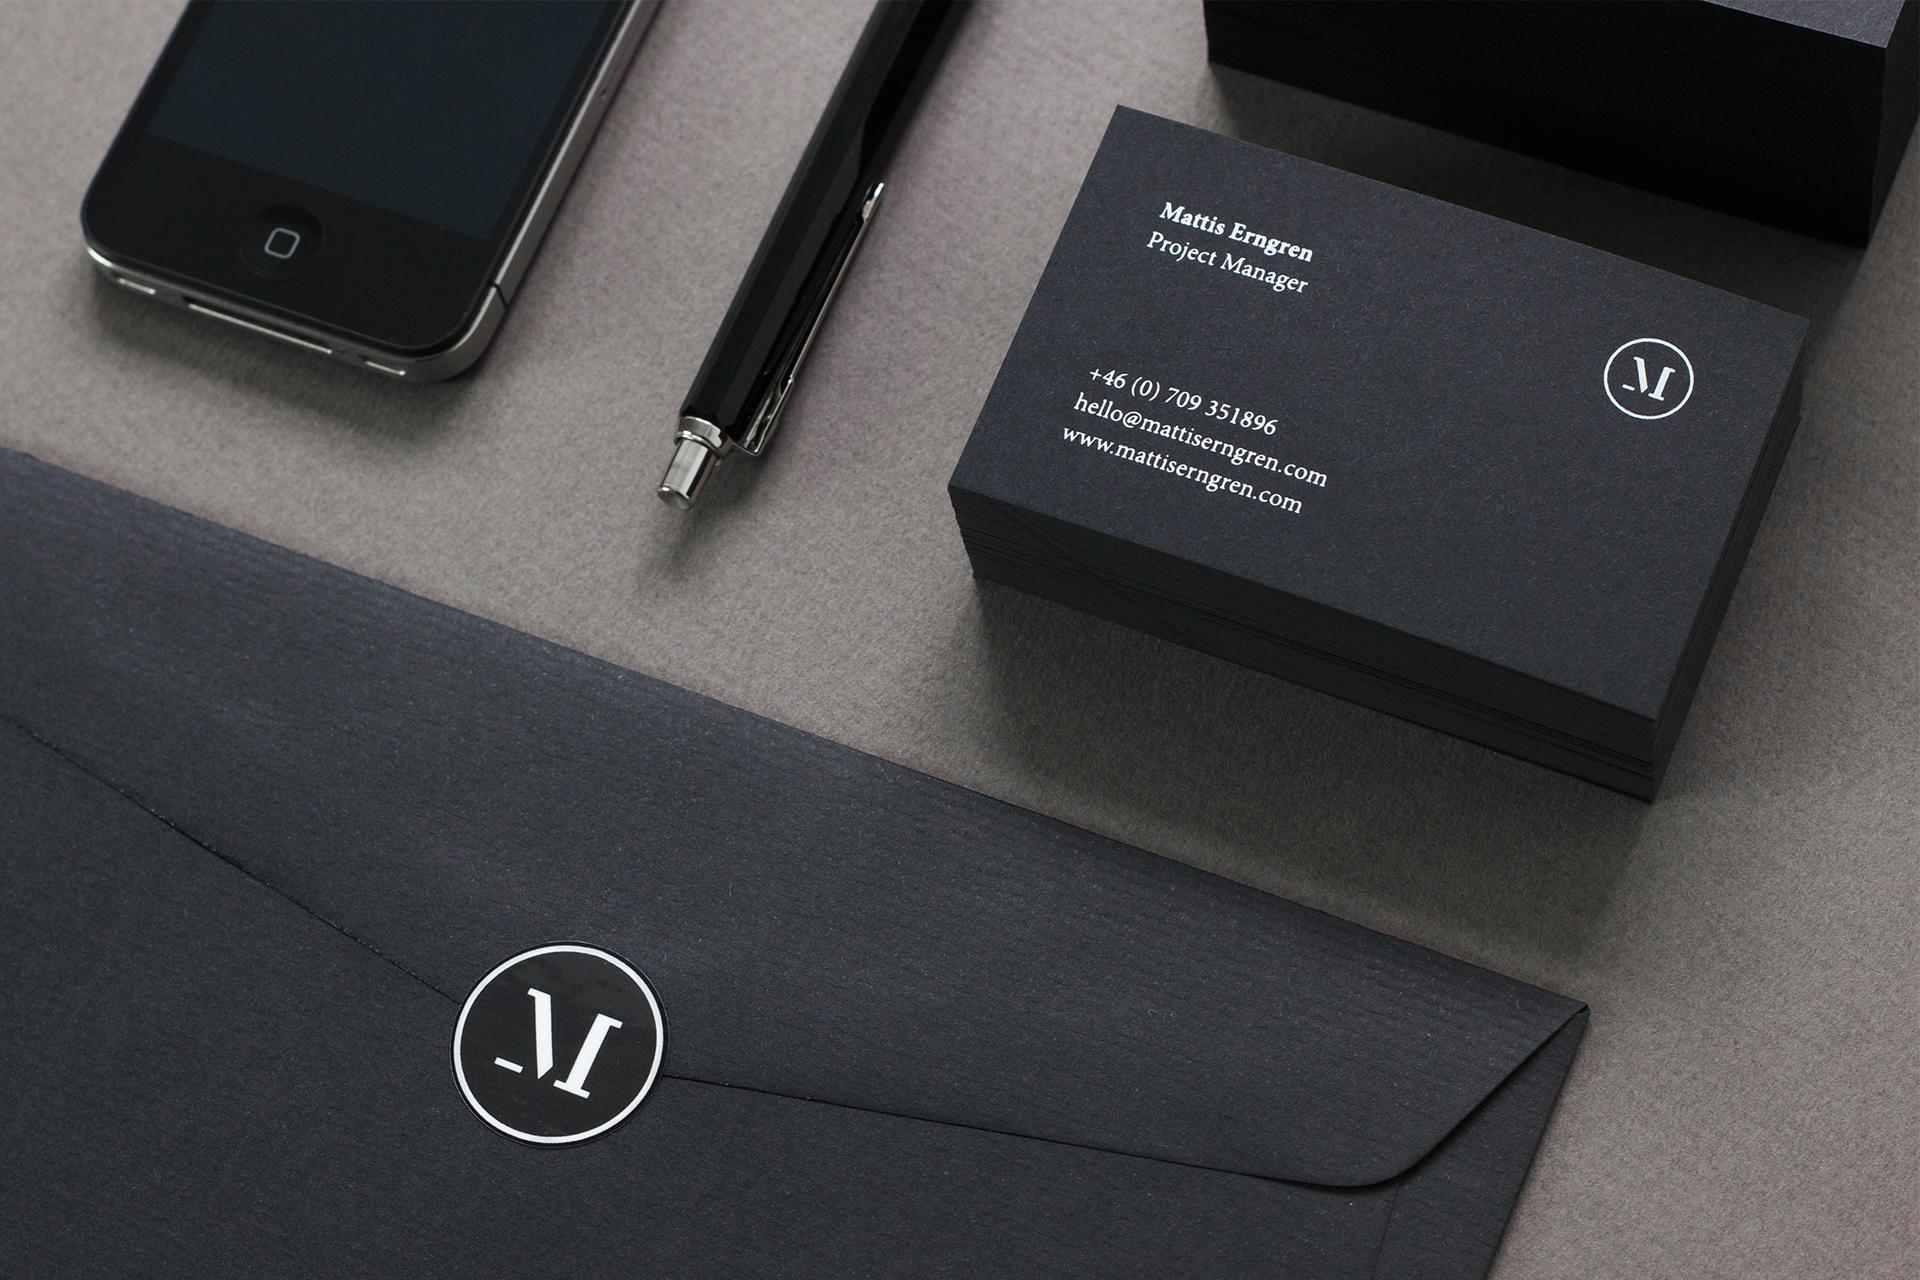 Branding Journal | Mattis Erngren